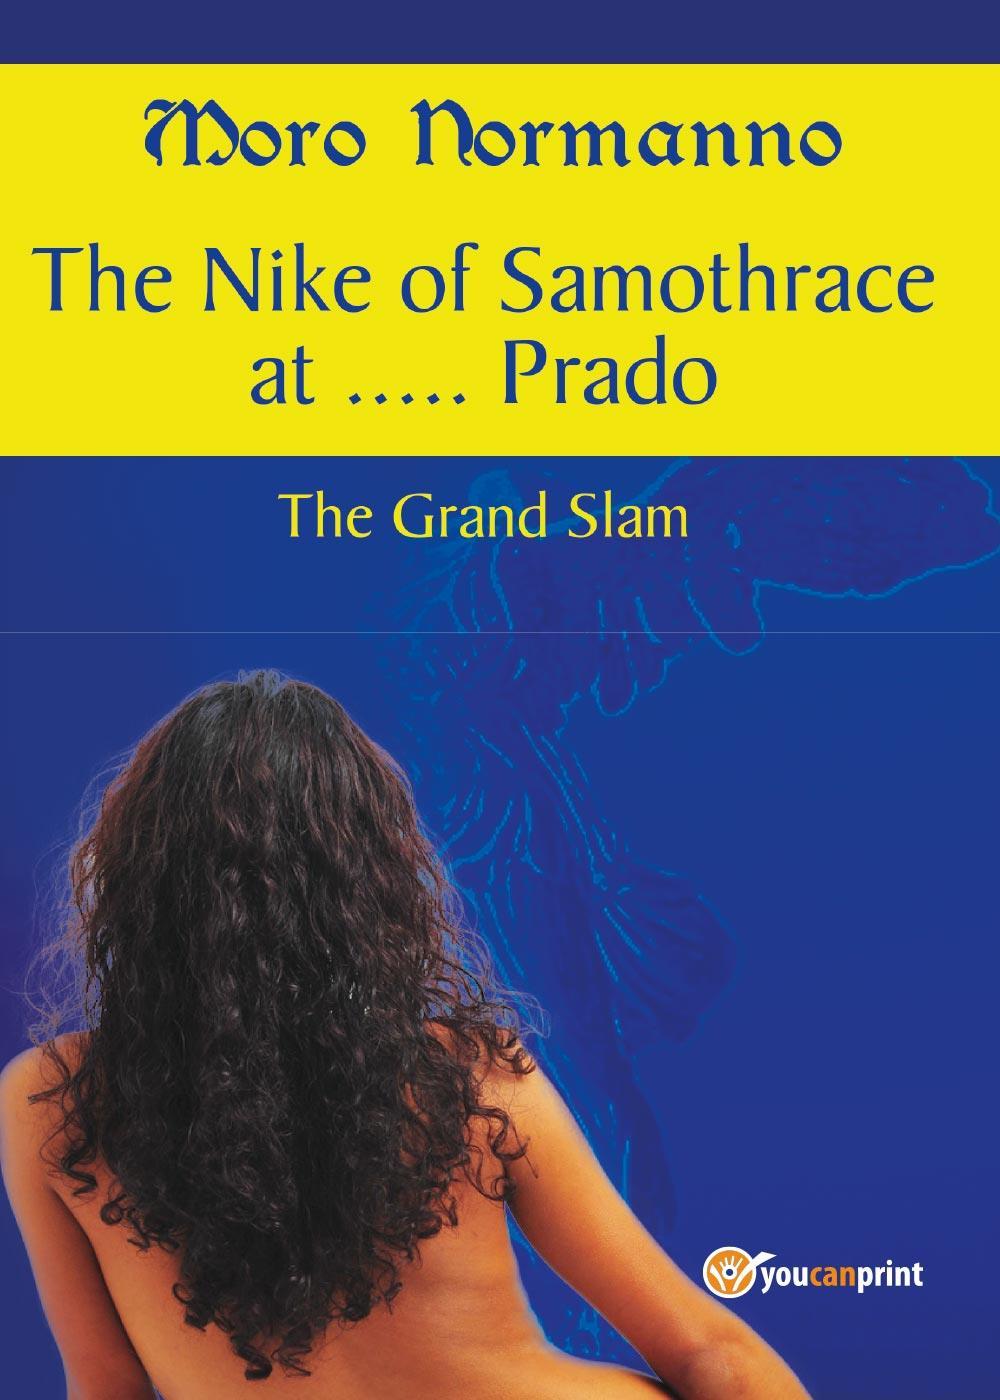 The Nike of Samothrace at... Prado. The Grand Slam.